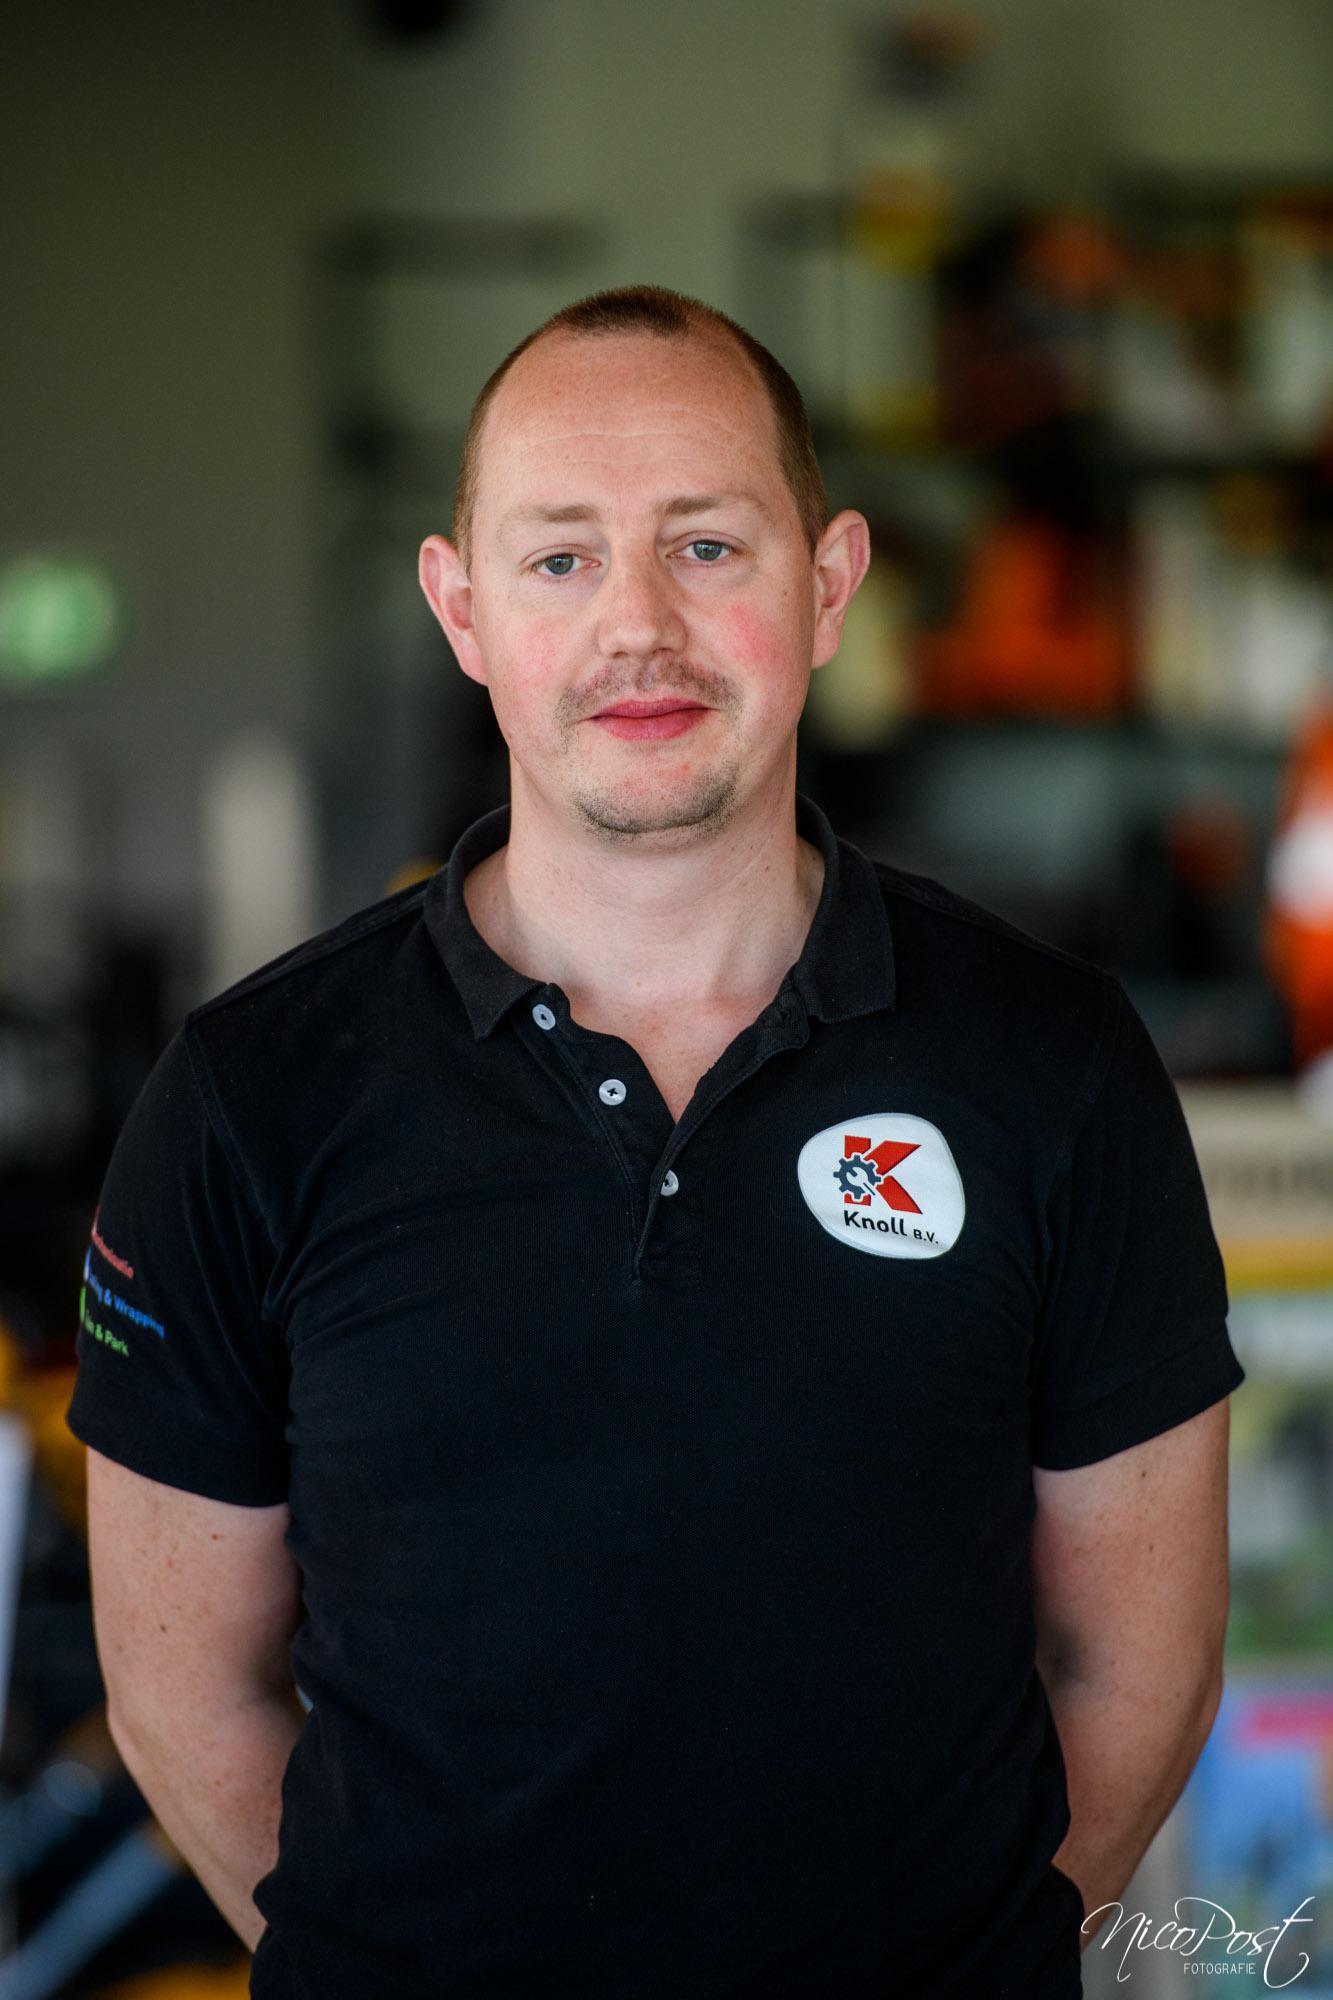 Erik Coster